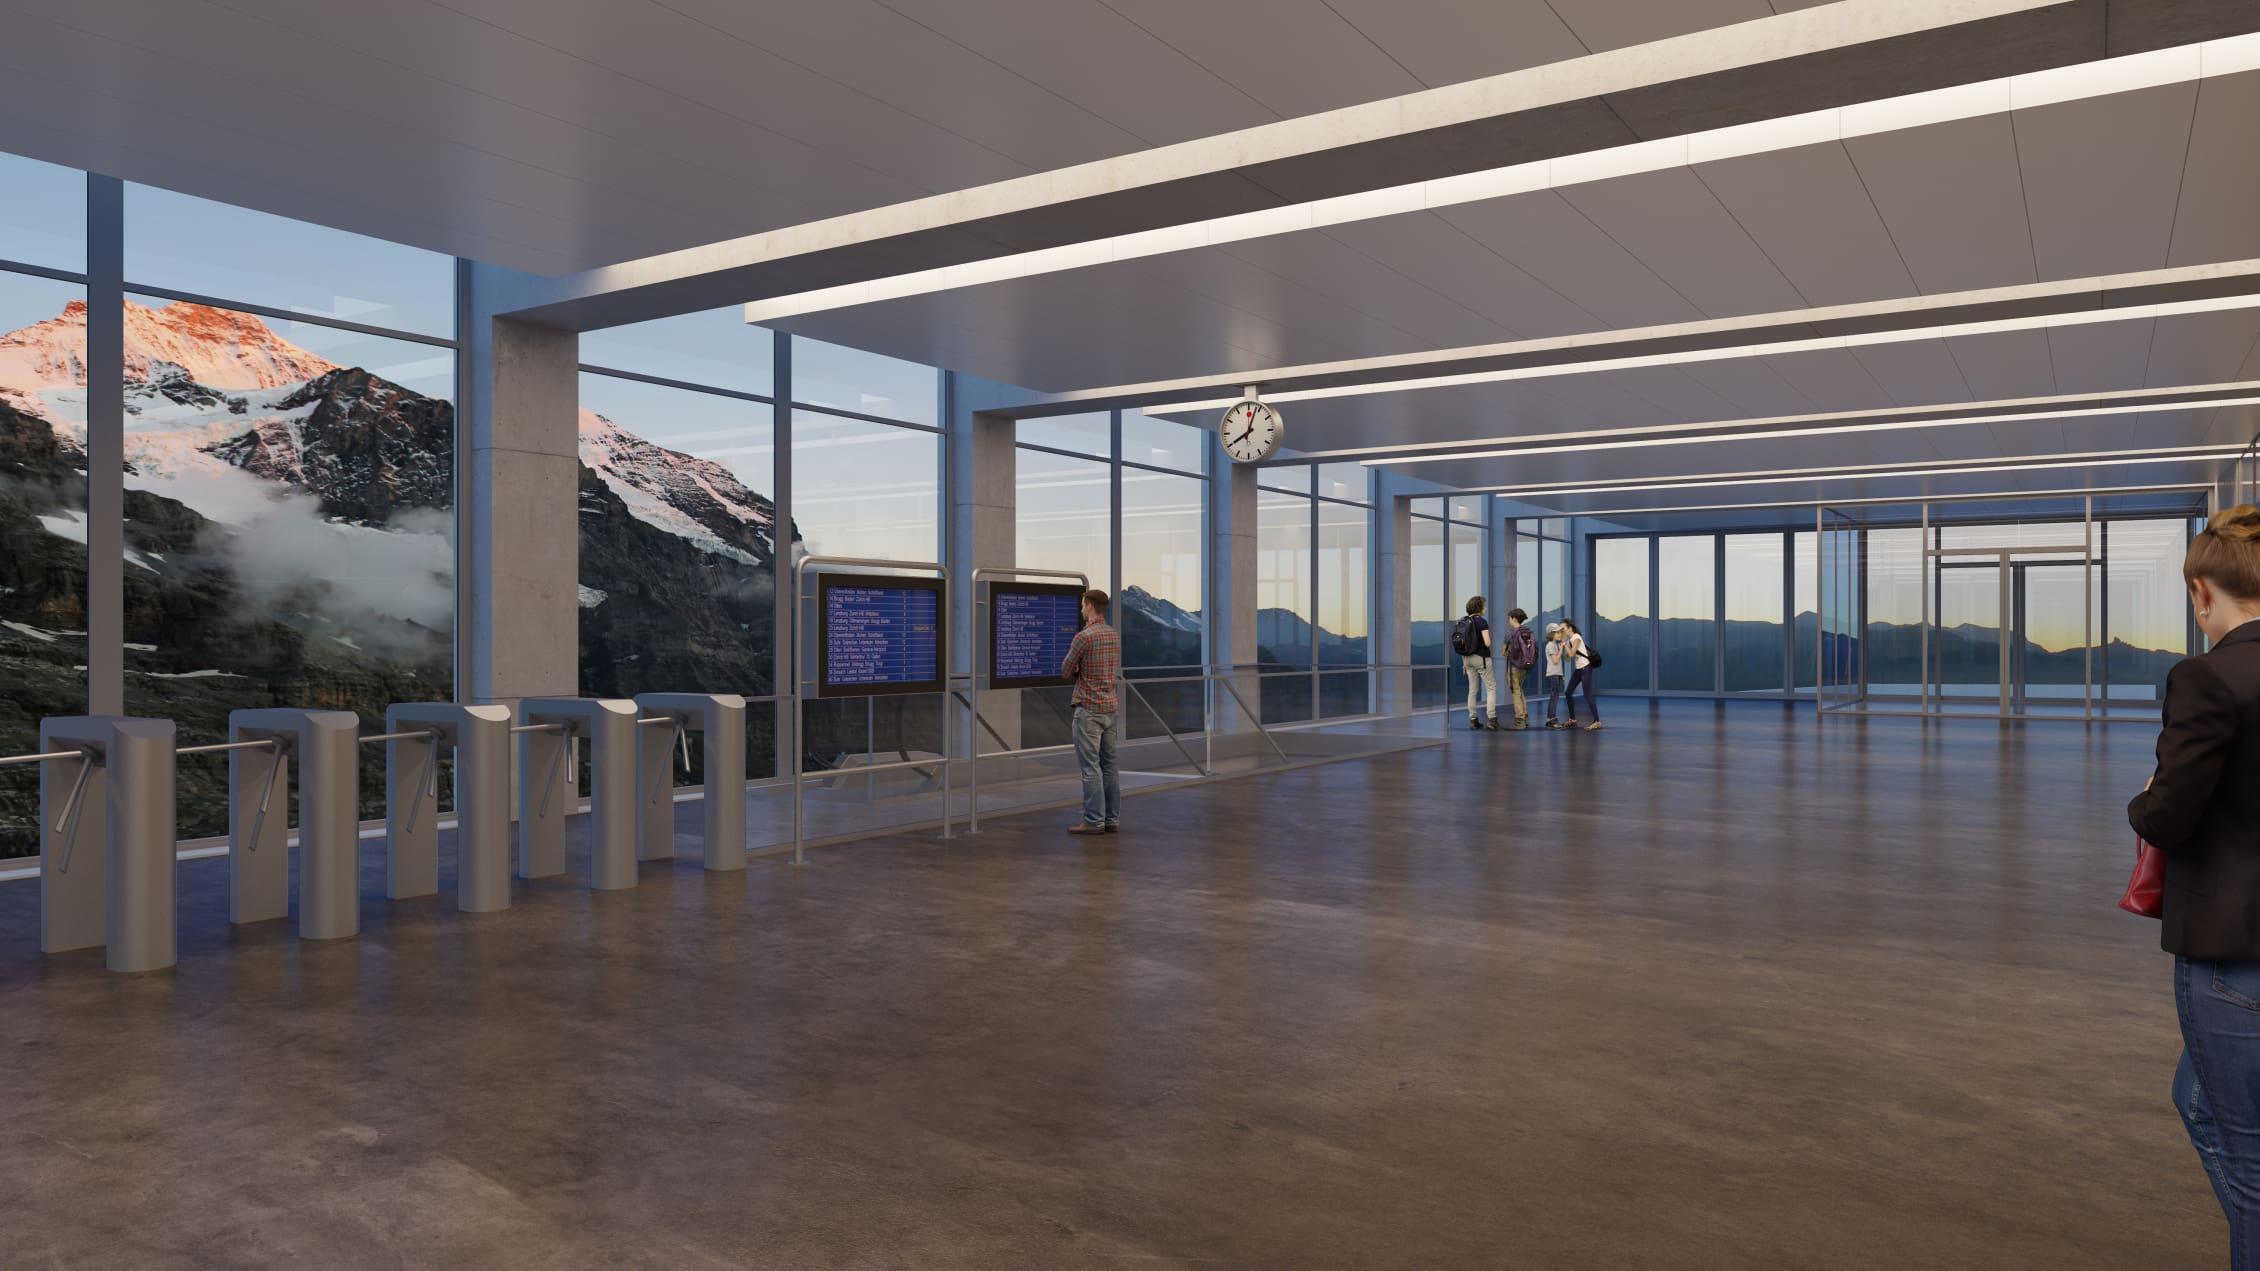 V bahn 3S Eigergletscher Panoramahalle 1